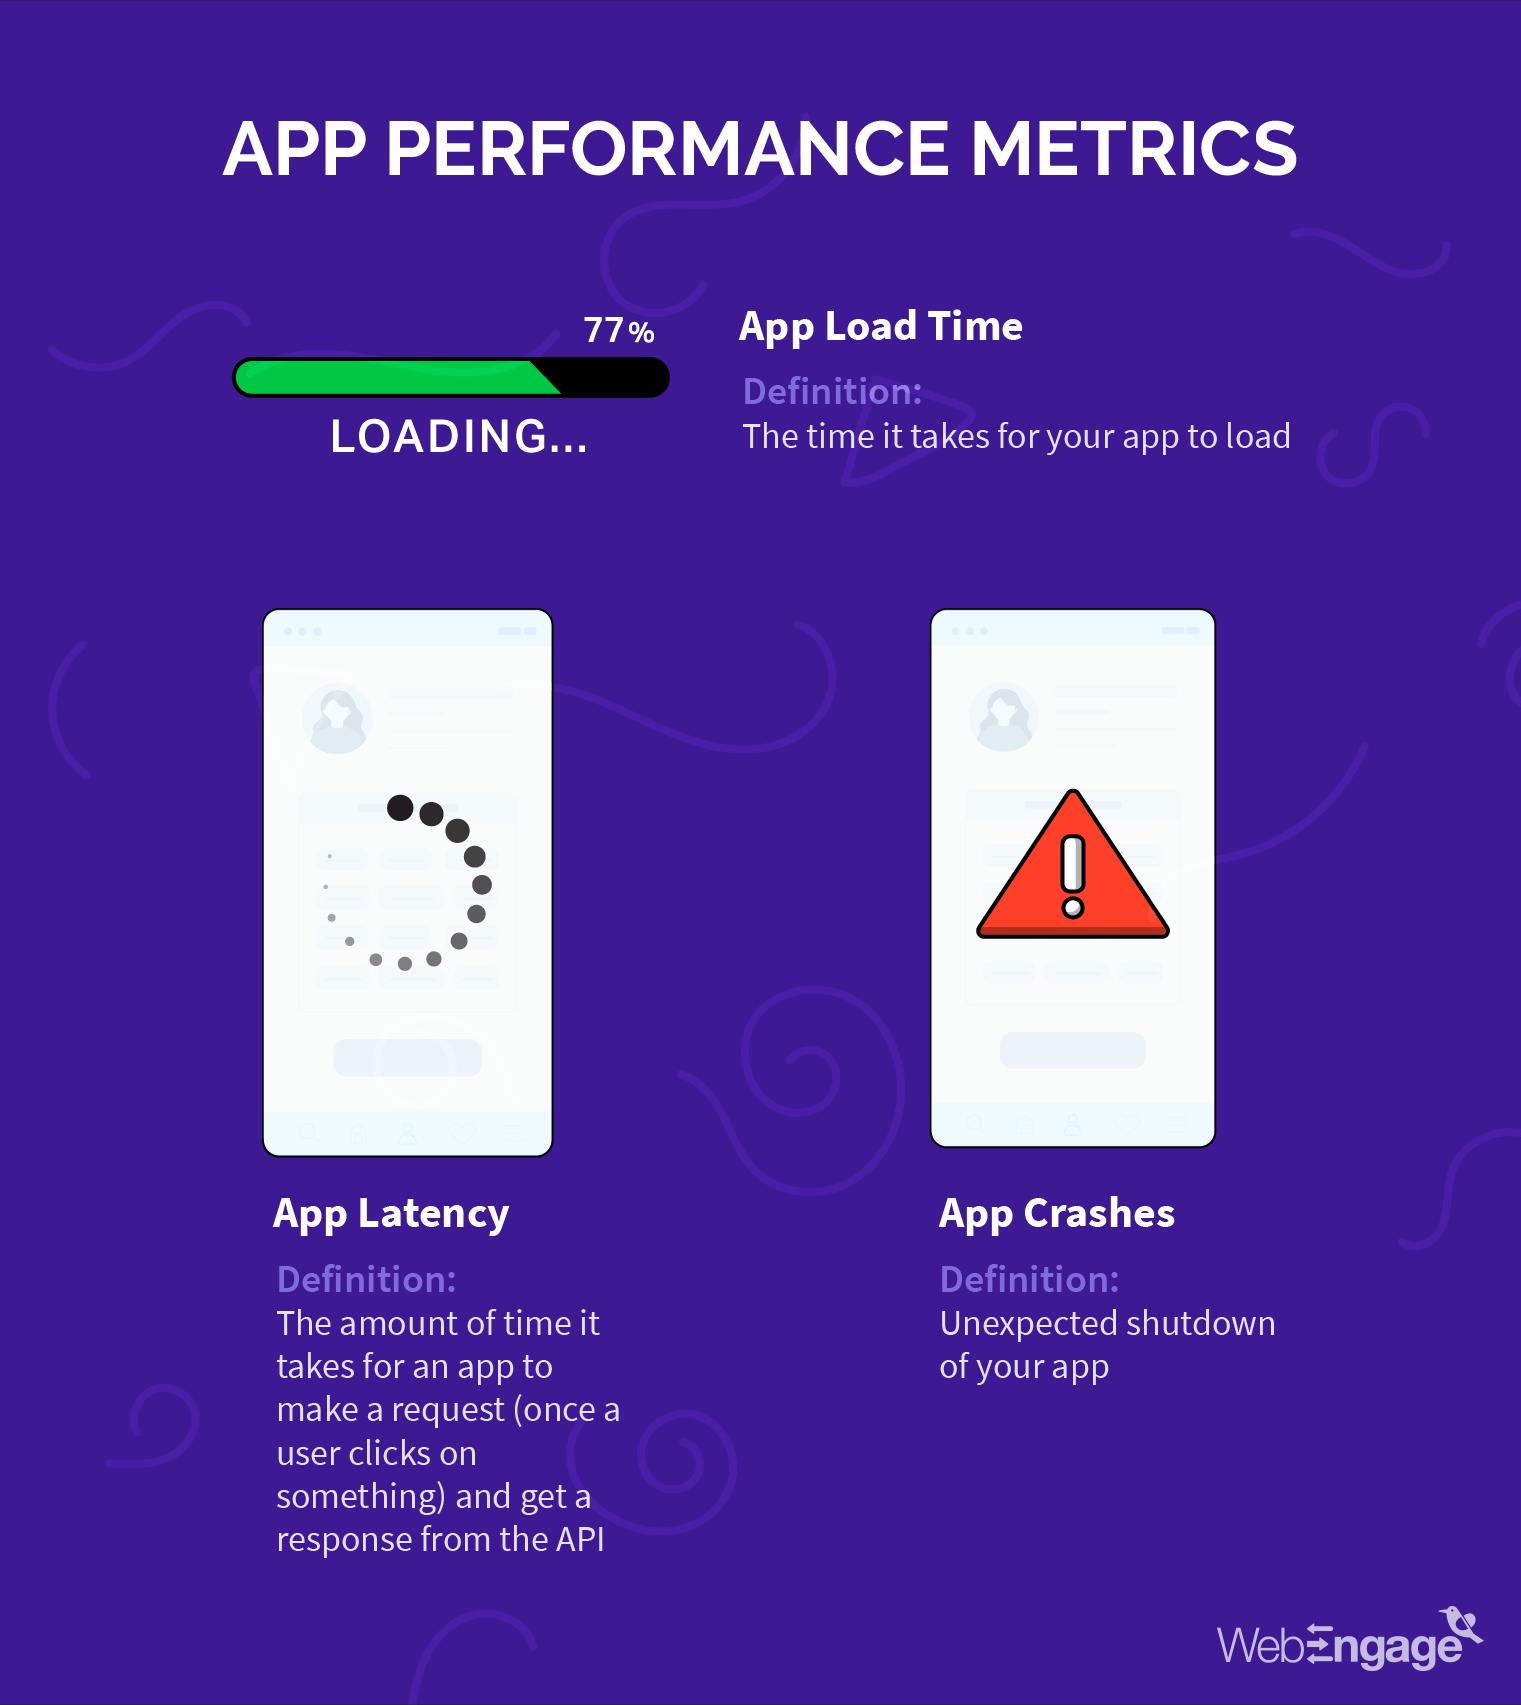 App performance metrics